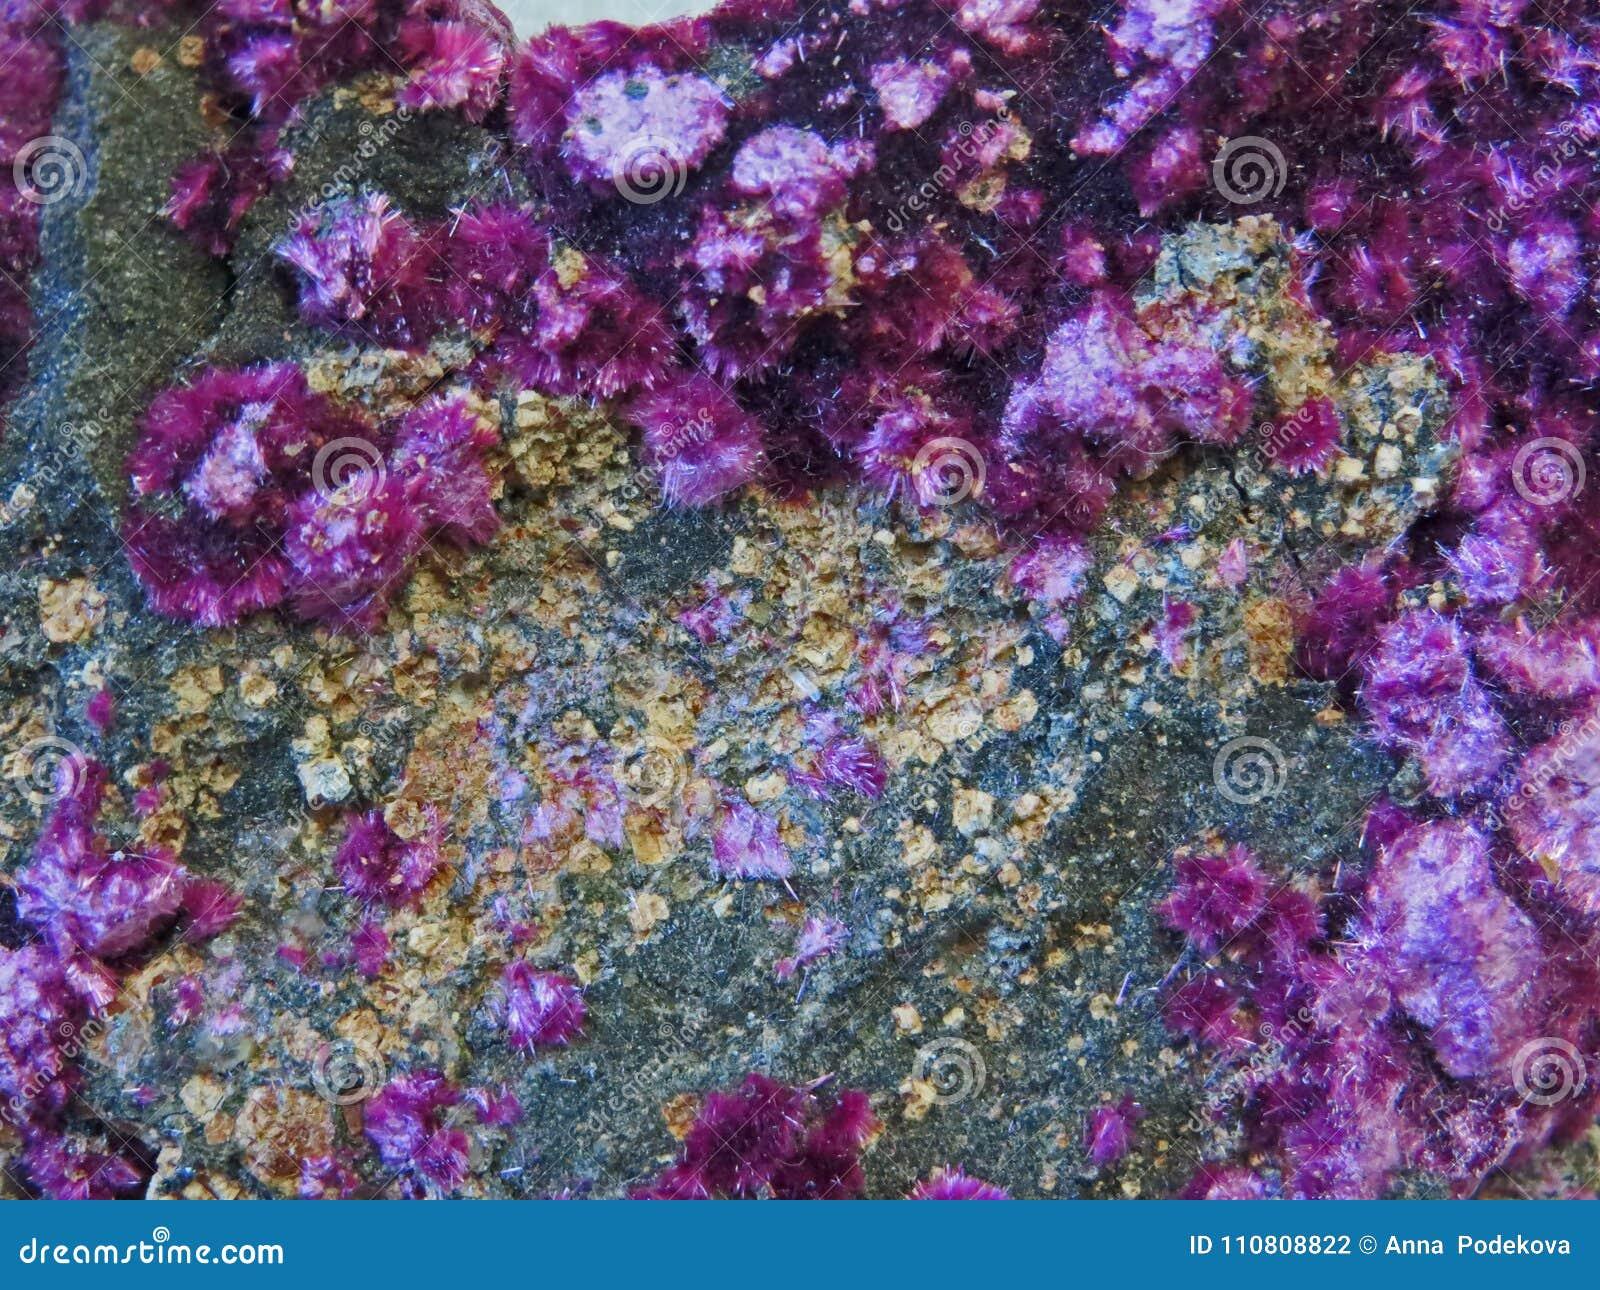 Formas naturais Minerais e texturas e fundos semipreciosos das pedras